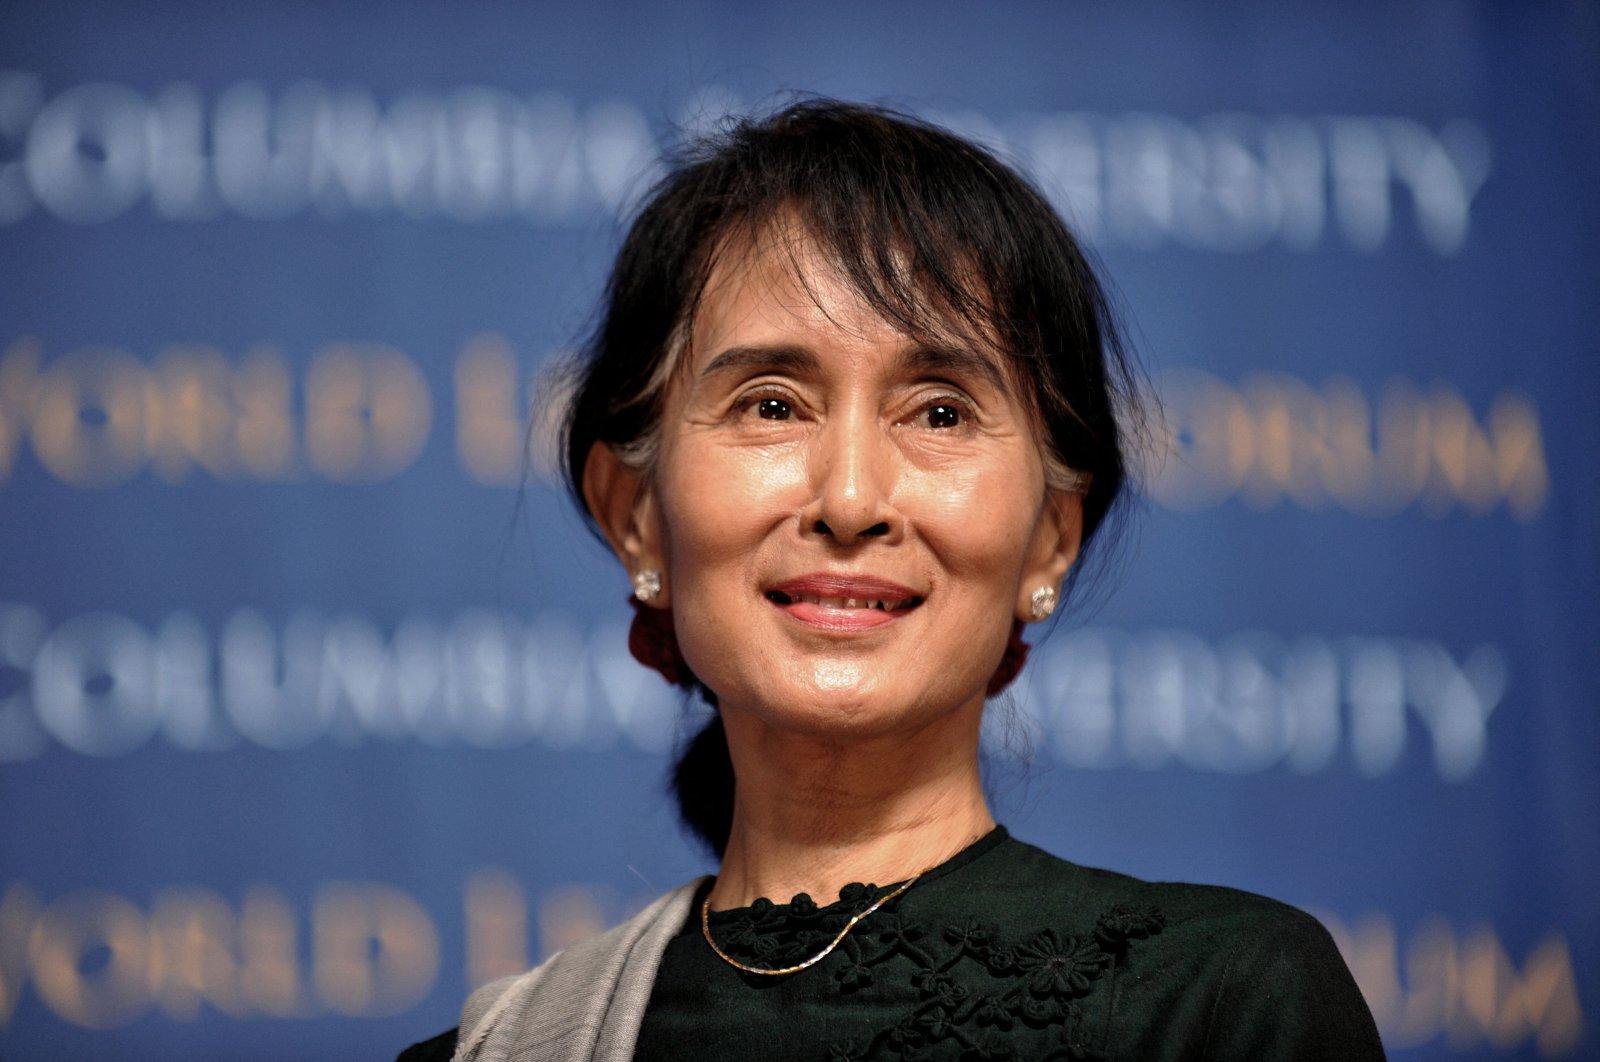 Myanmarese member of parliament Aung San Suu Kyi speaks at the Low Memorial Library at Columbia University in New York, U.S., Sept. 22, 2012. (AFP Photo)